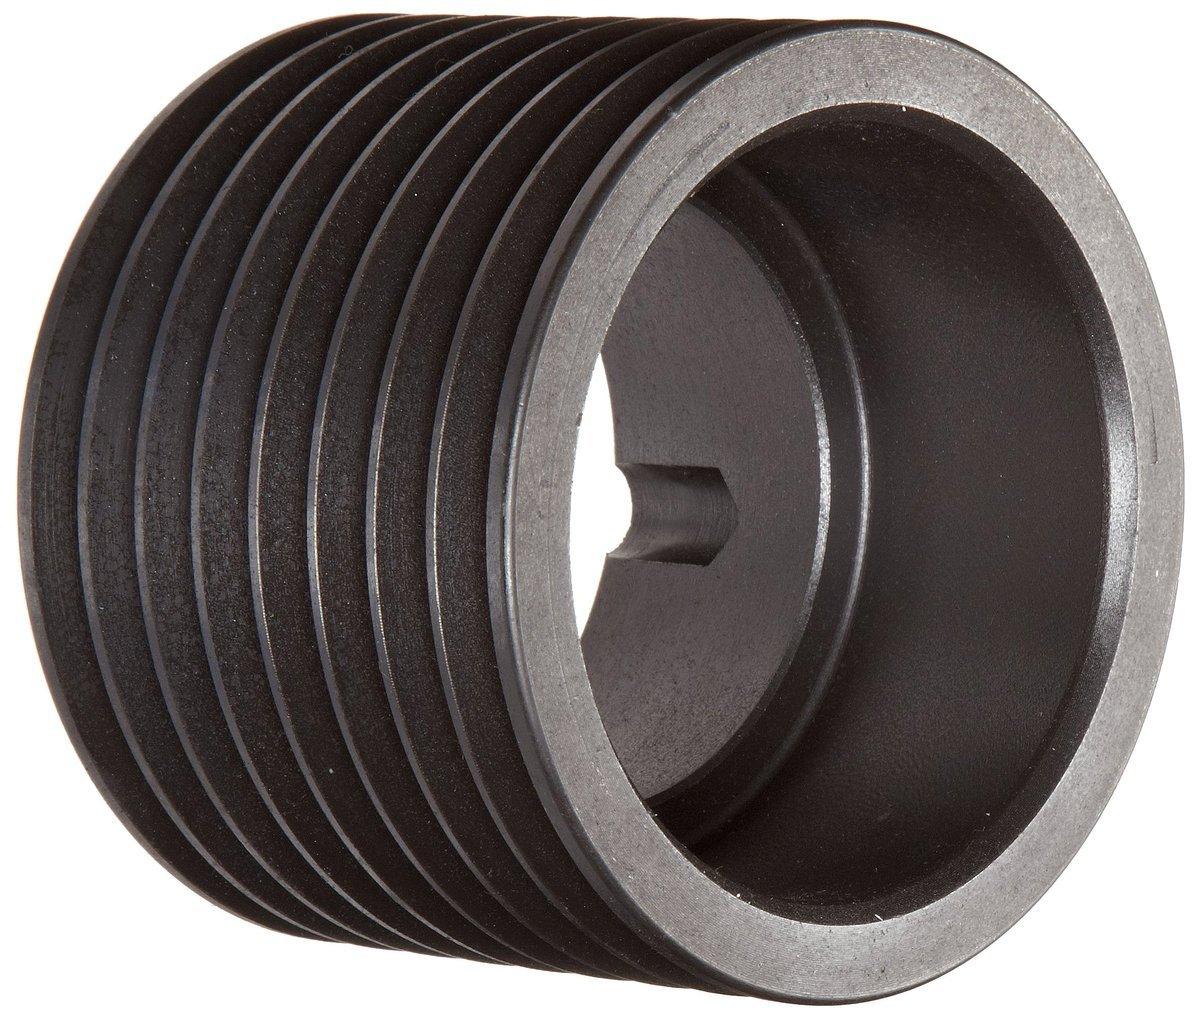 TL SPB212X8.3535 Ametric Metric 212 mm Outside Diameter, 8 Groove SPB/17 Dynamically Balanced Cast Iron V-Belt Pulley/Sheave,for 3535 Taper Lock Bushing, (Mfg Code 1-013)